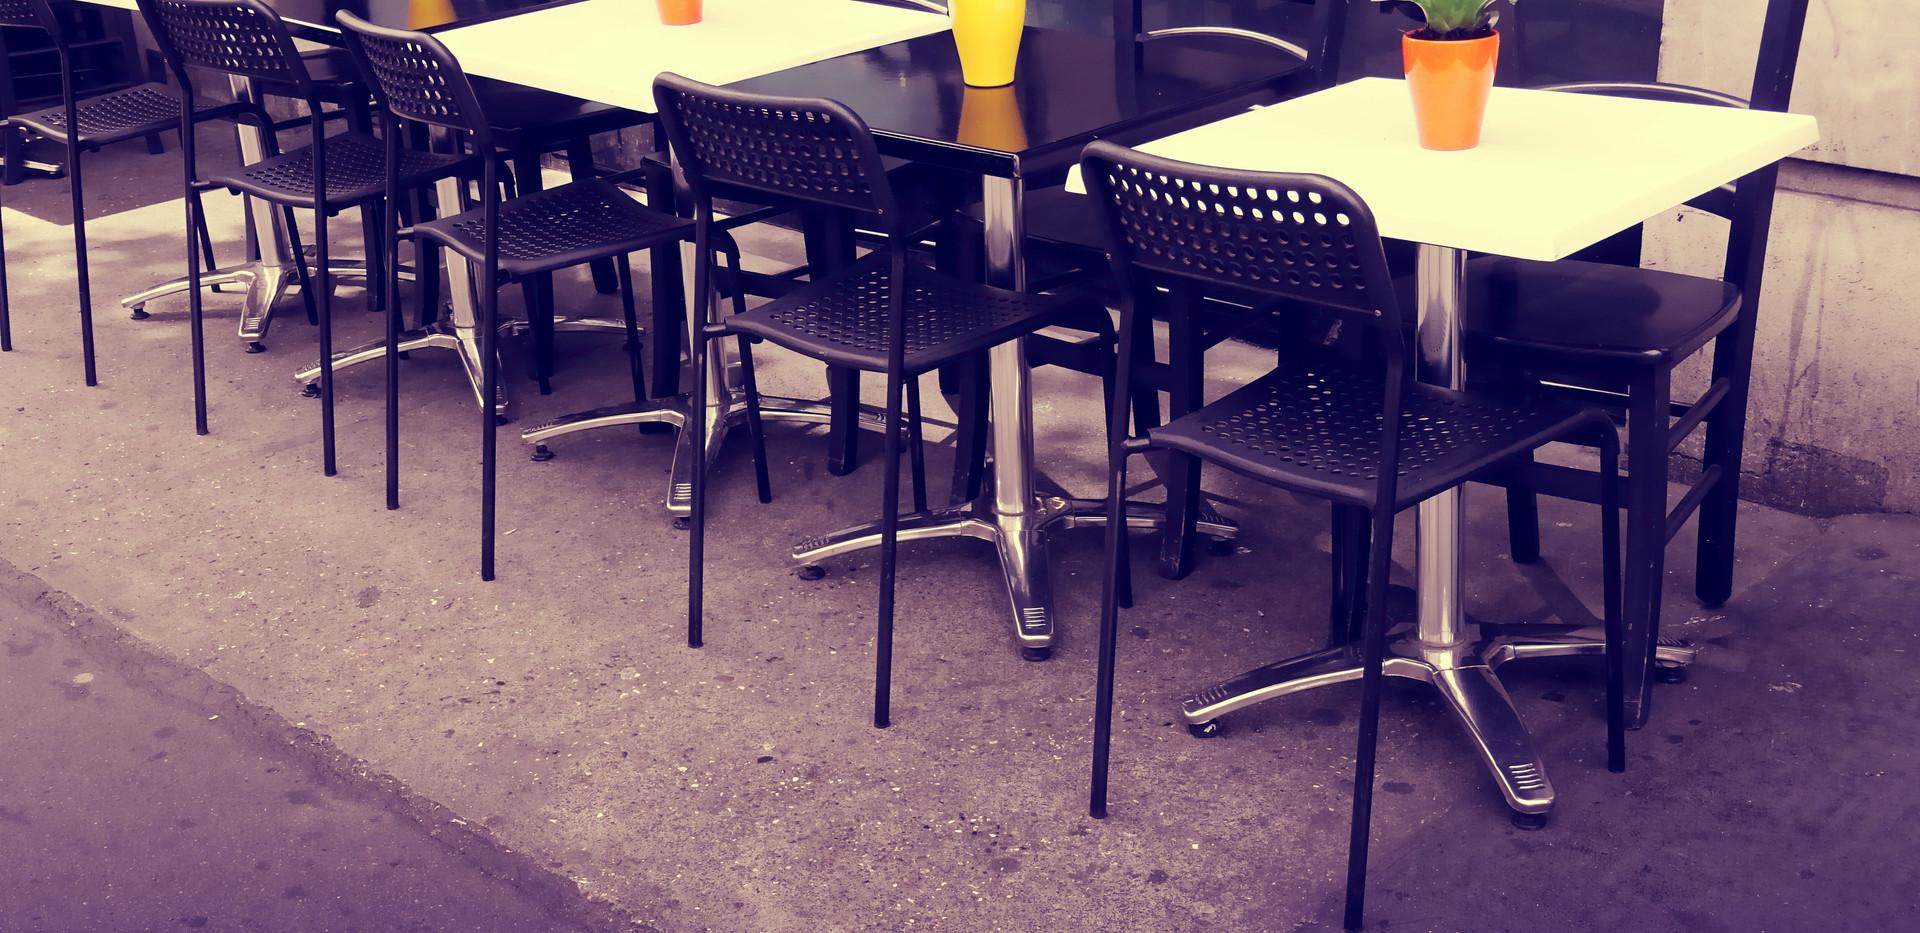 bistro-business-cafeteria-425008.jpg